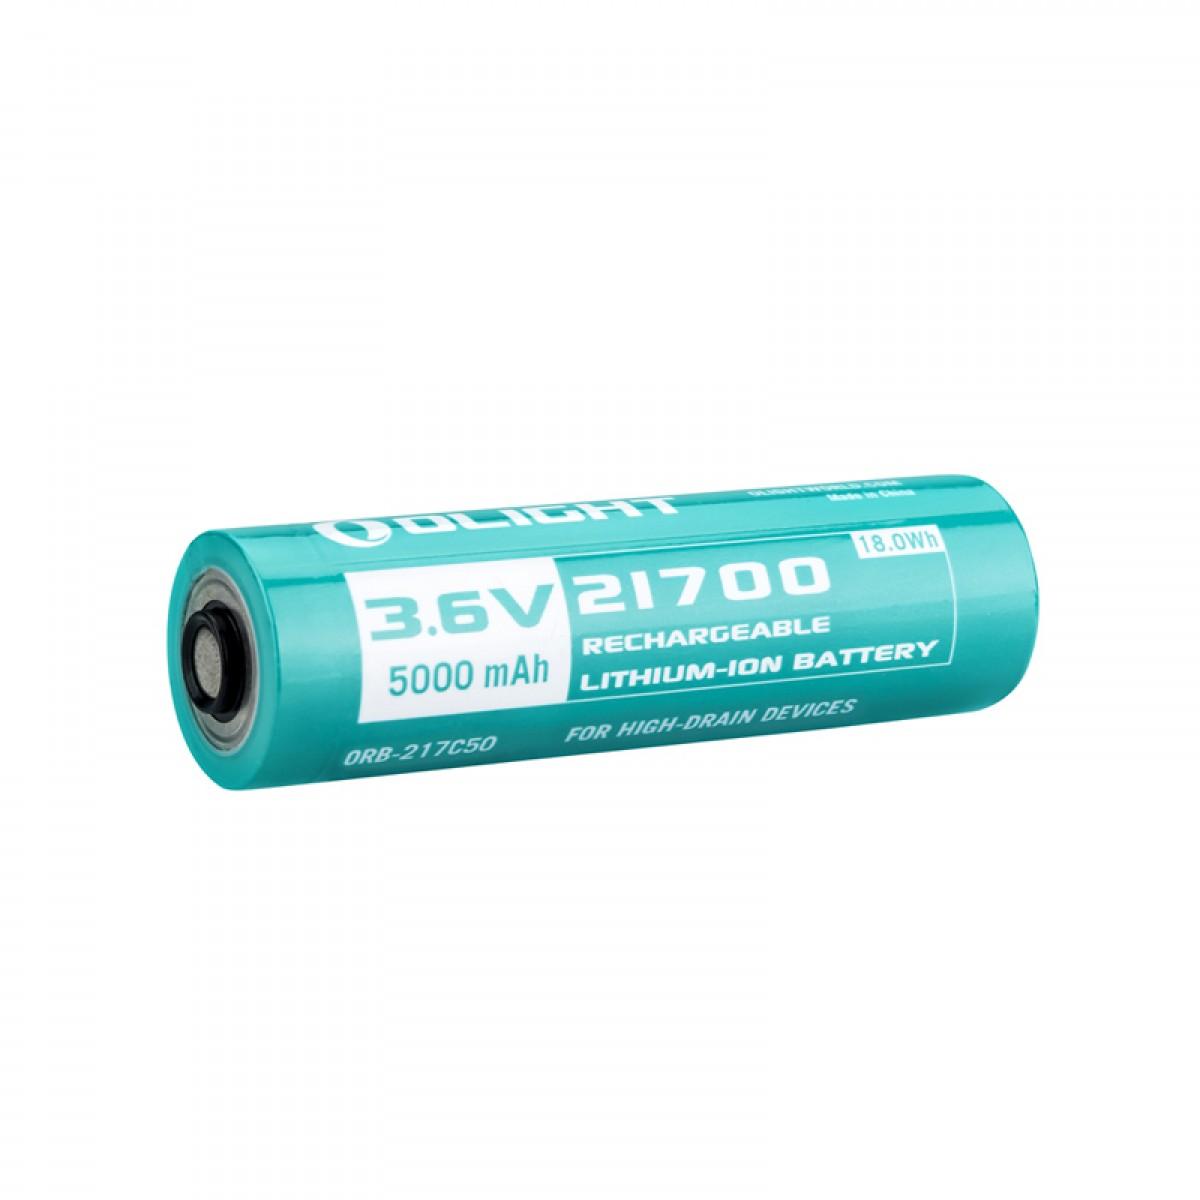 Olight Customized 21700 5000mAH Li-ion Battery